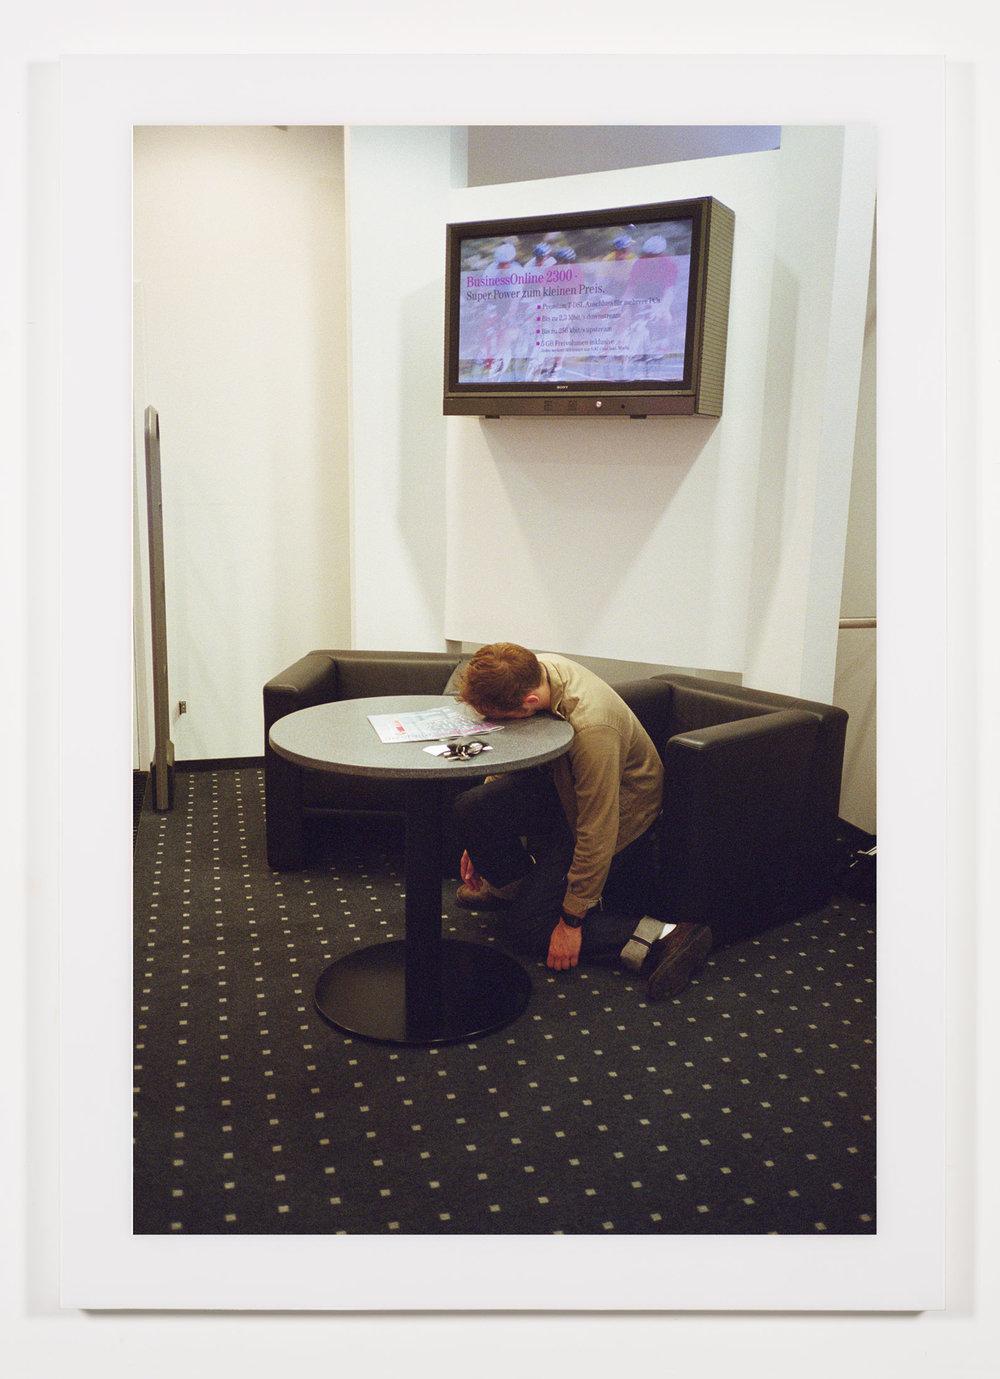 The Phenomenology of Shopping (T-Mobile, Alexanderplatz, Berlin, Germany)   2002  Chromogenic print  68 x 47 3/4 inches   The Phenomenology of Shopping, 2001–2003